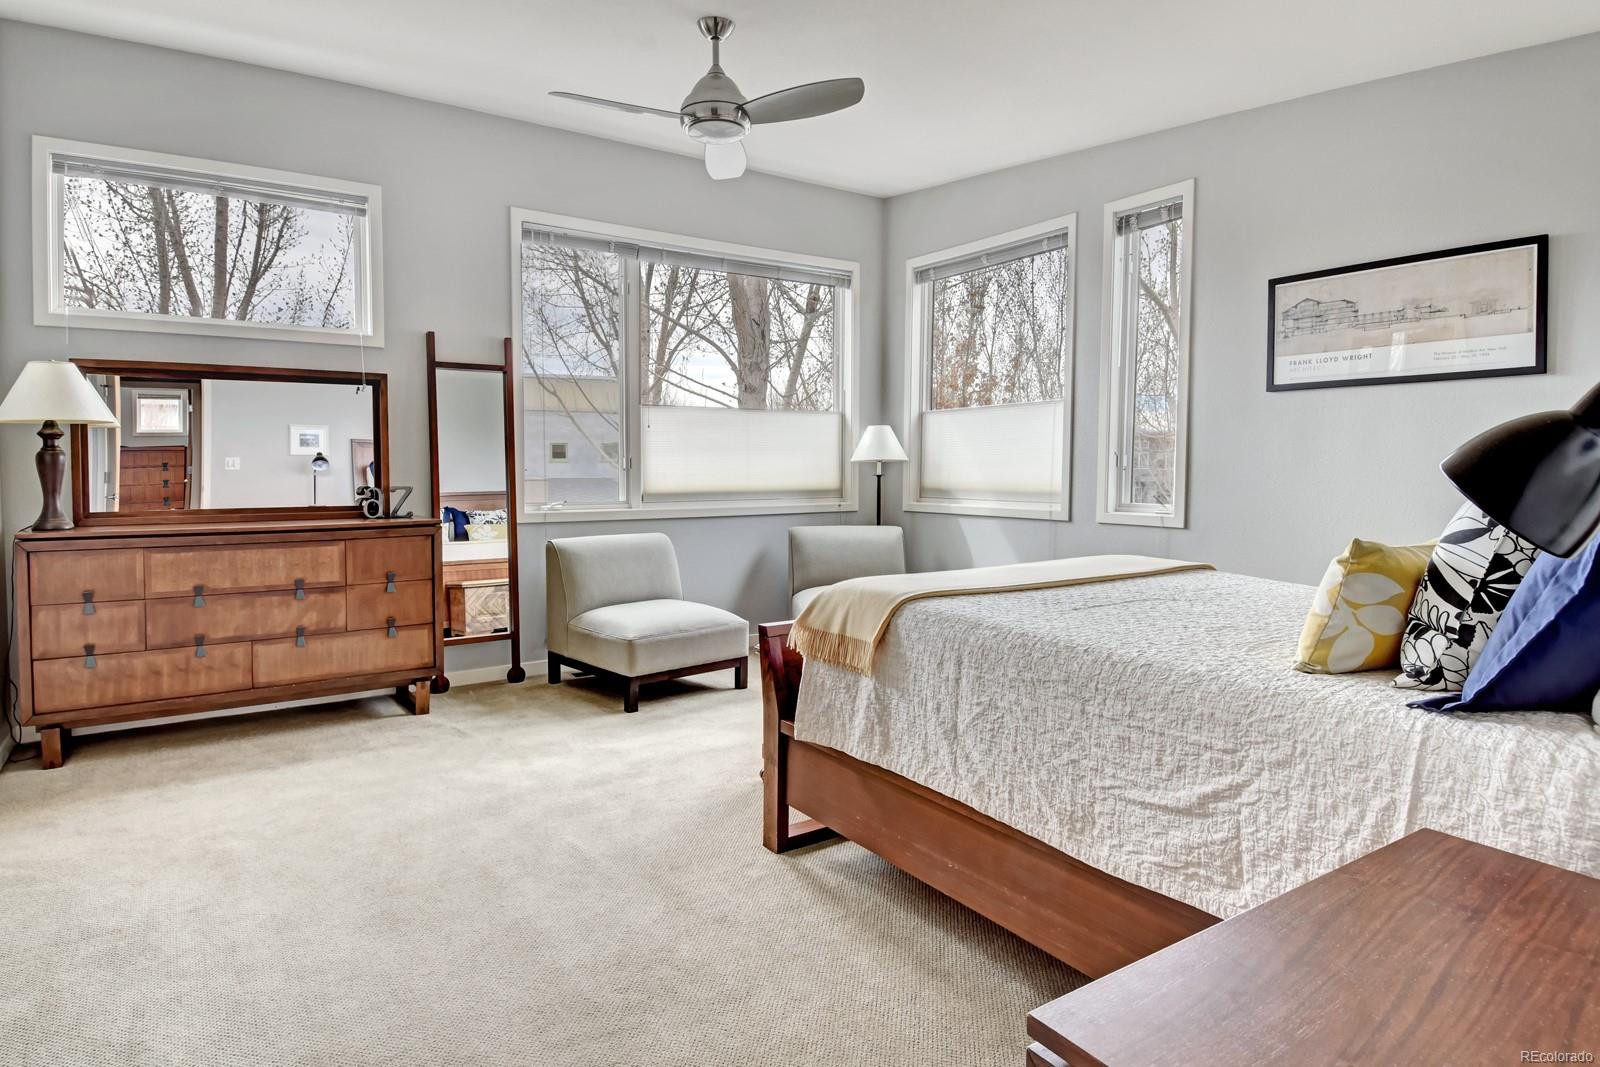 Master Bedroom in the Treetops